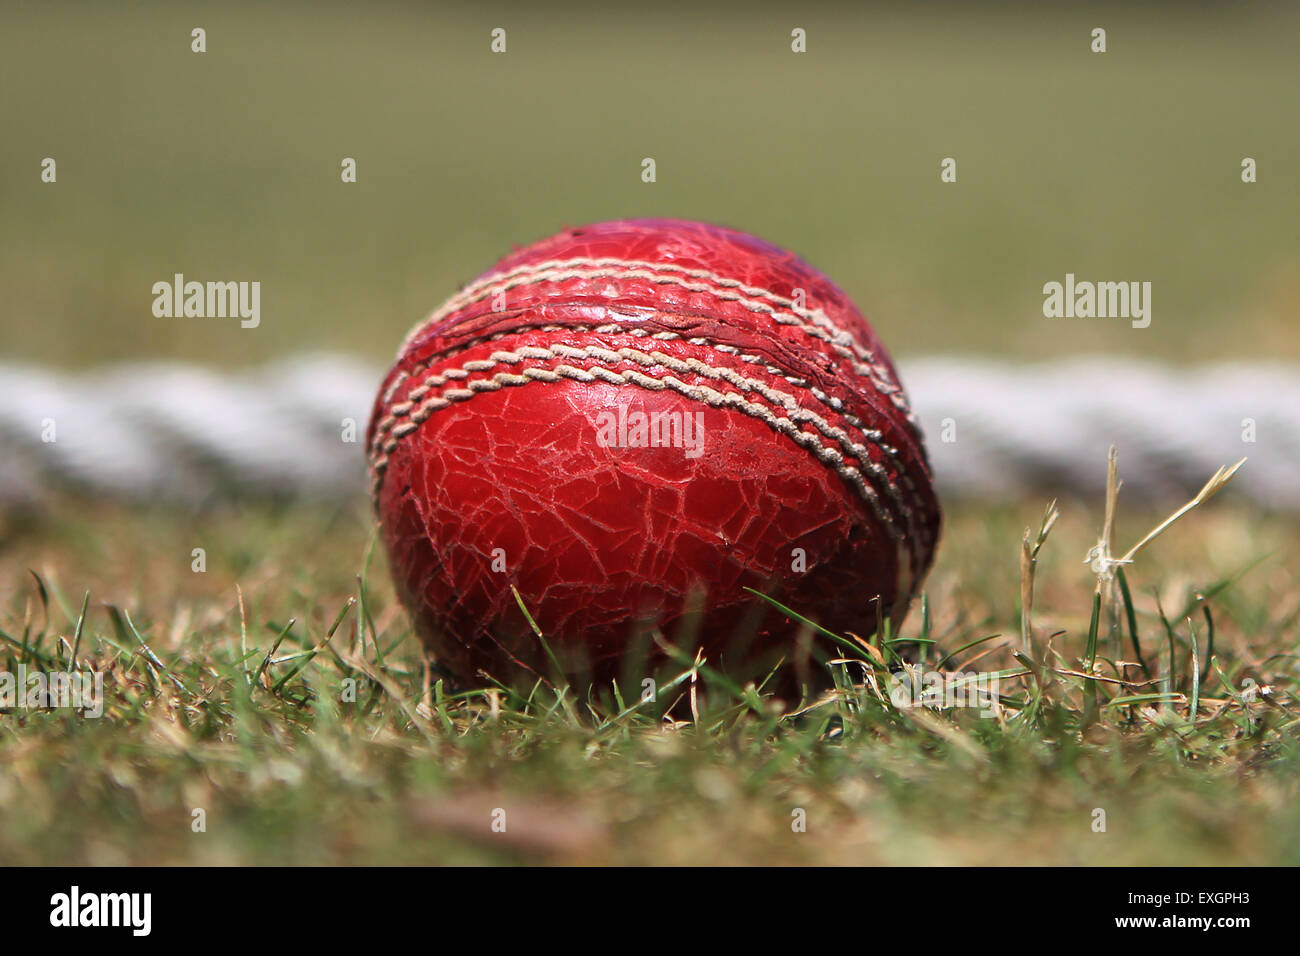 Cricket - Kent Cricket League Division IV 1st XI - Faversham Cricket Club v Cowdrey Cricket Club - Stock Image